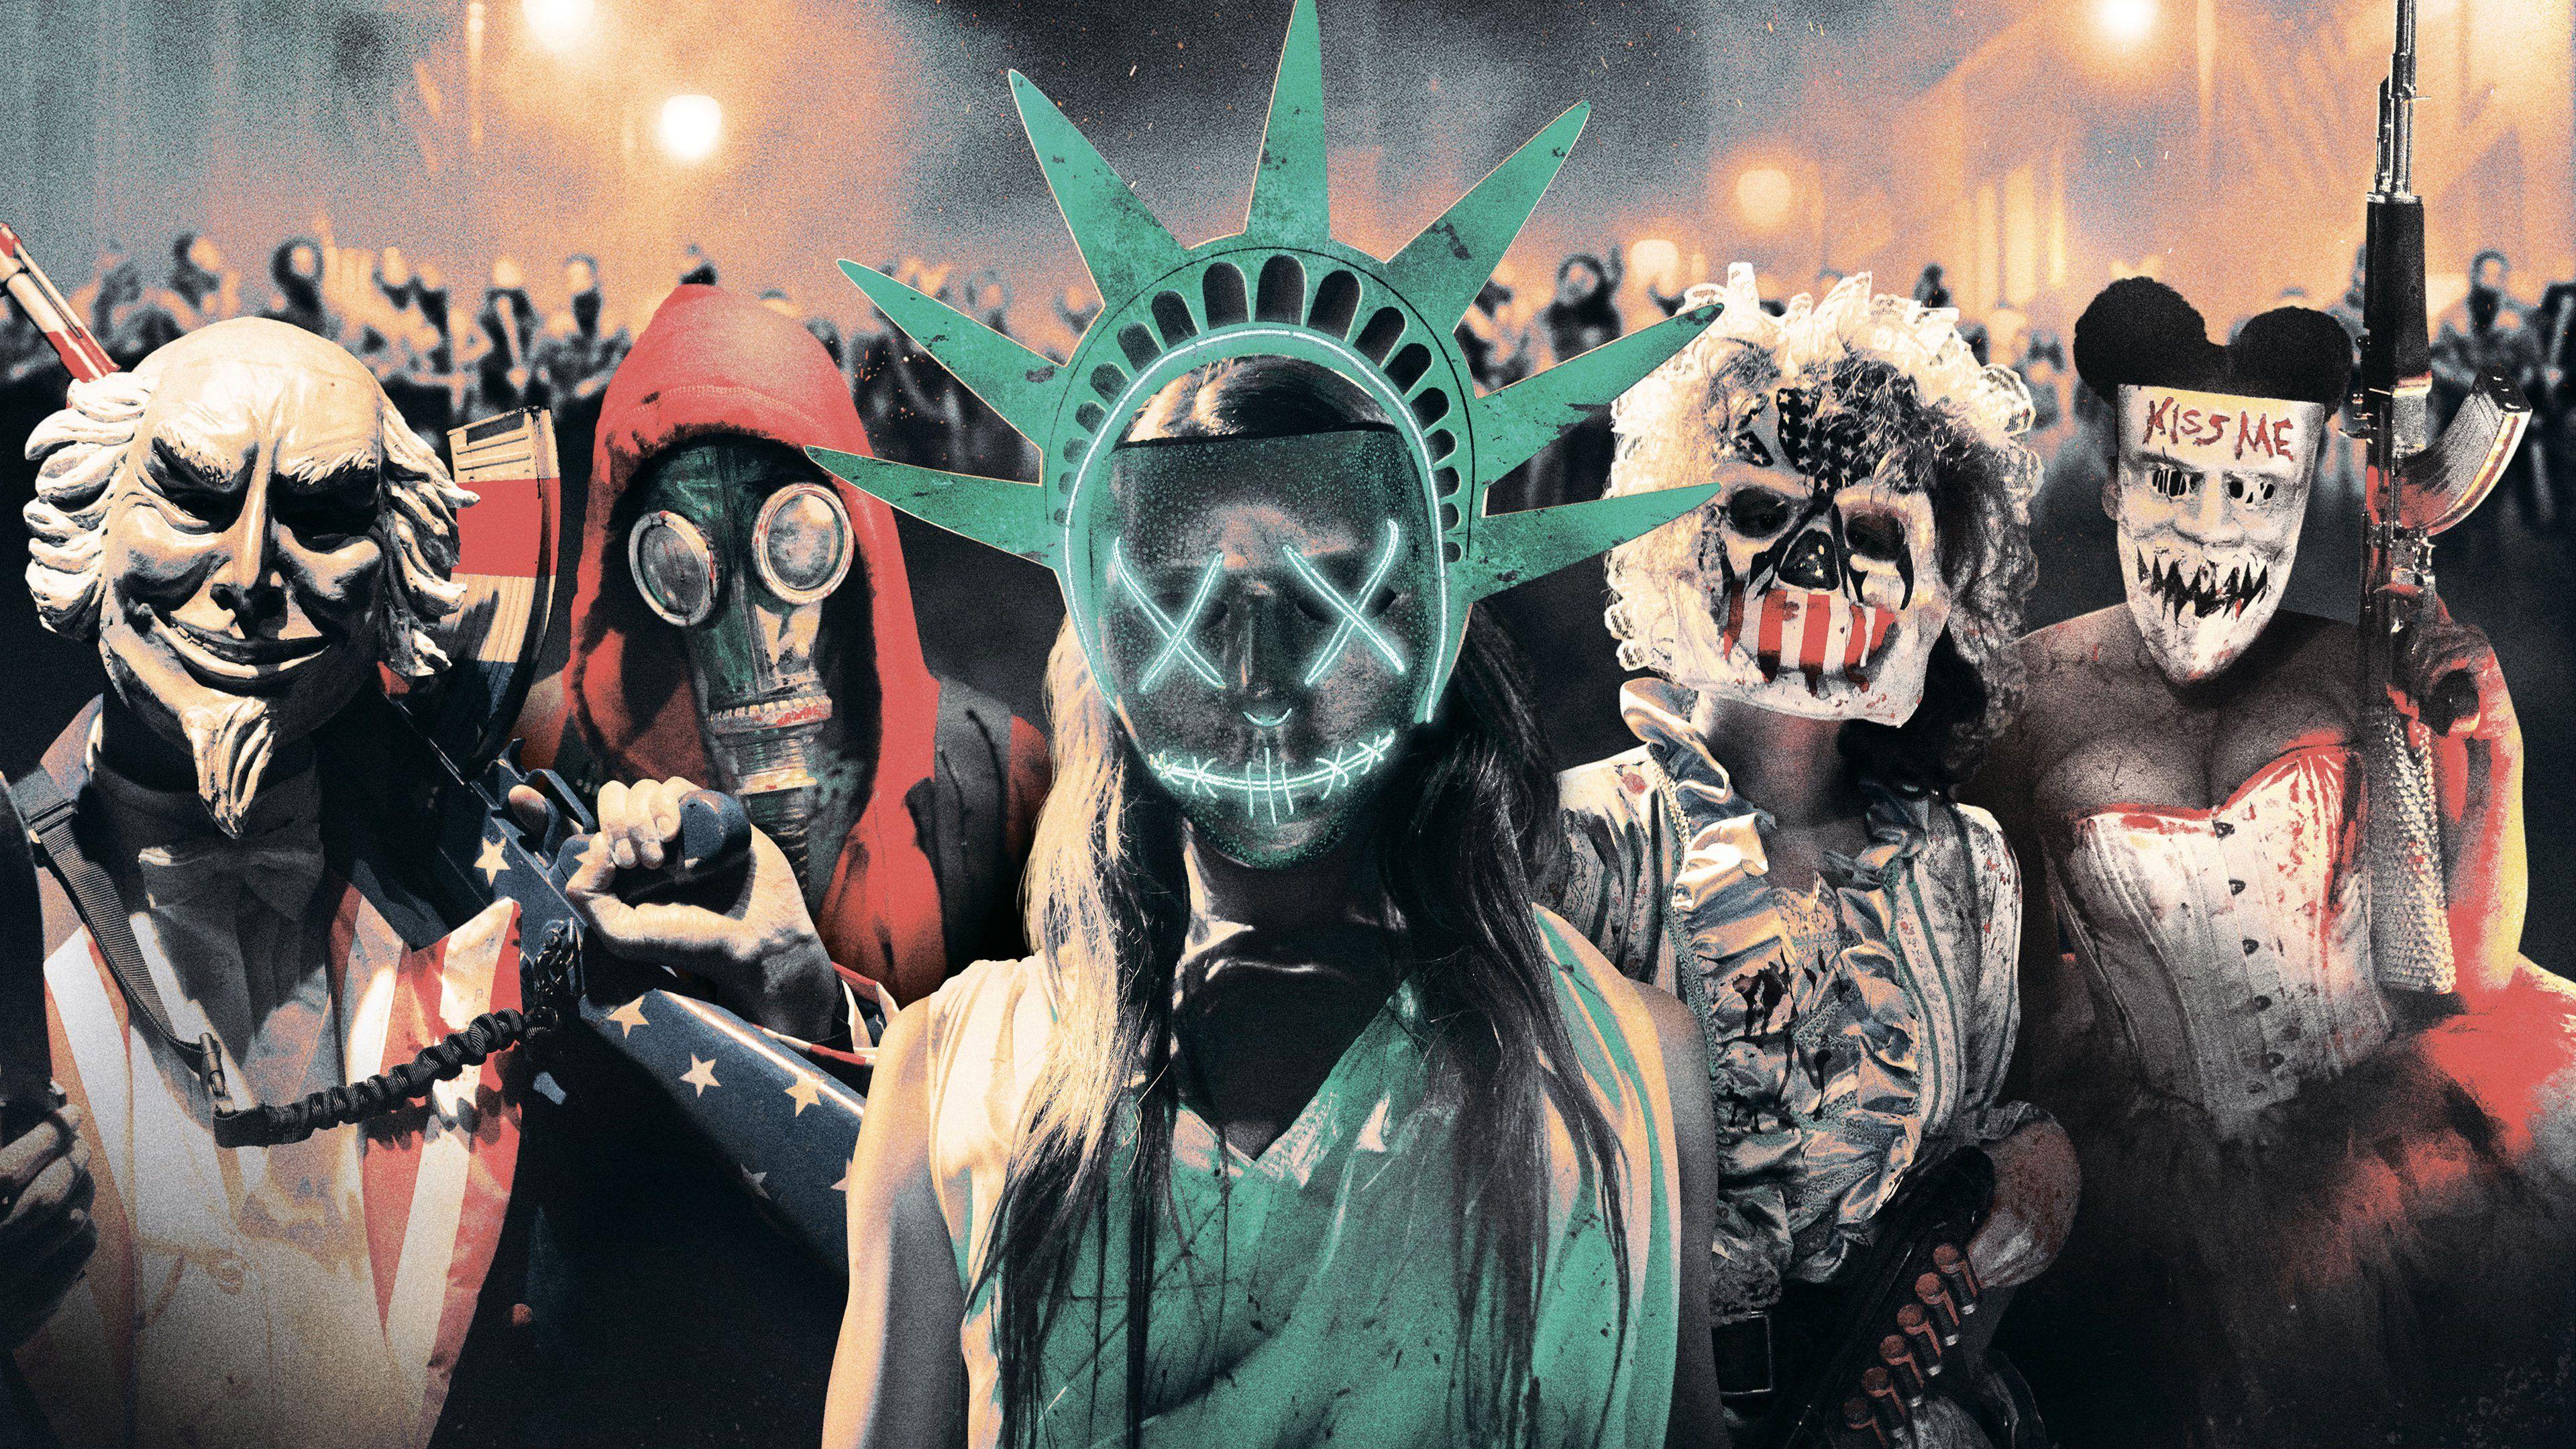 10 Best \u0027The Purge\u0027 Costume Ideas 2019 Masks, Outfit Ideas